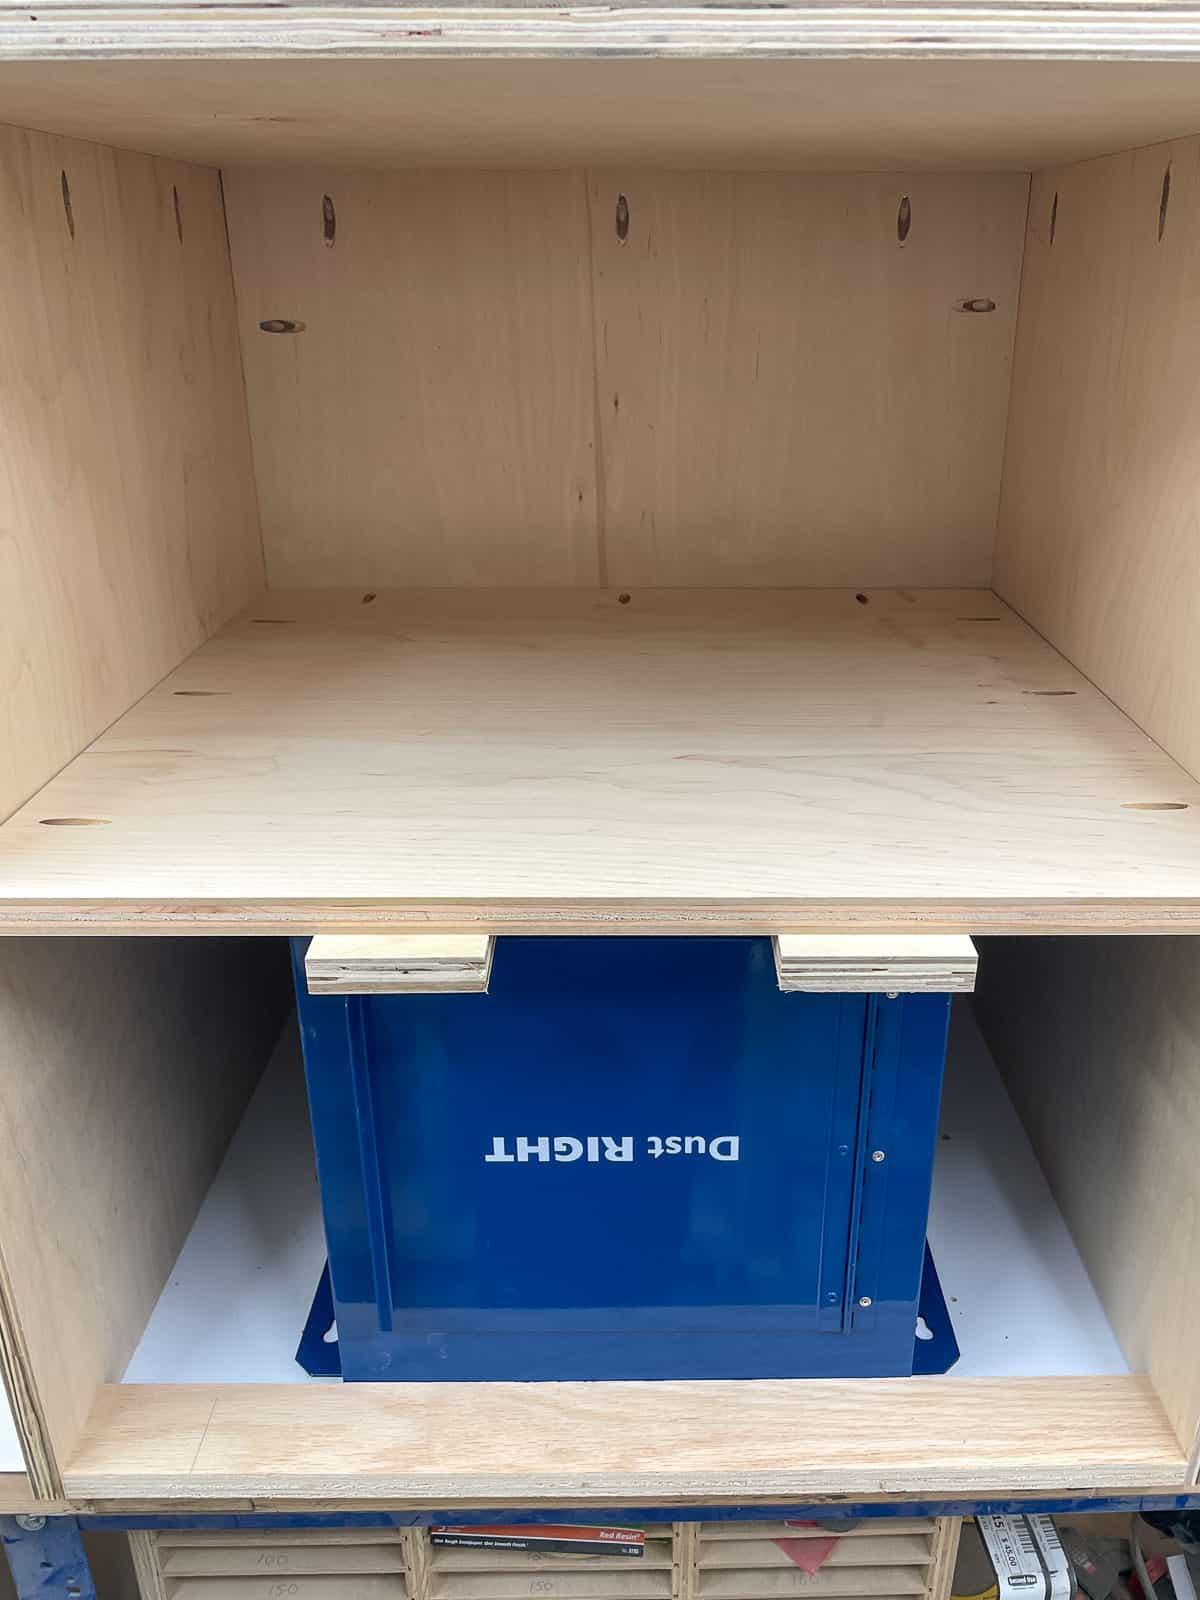 installing router table cabinet shelf below the dust bucket